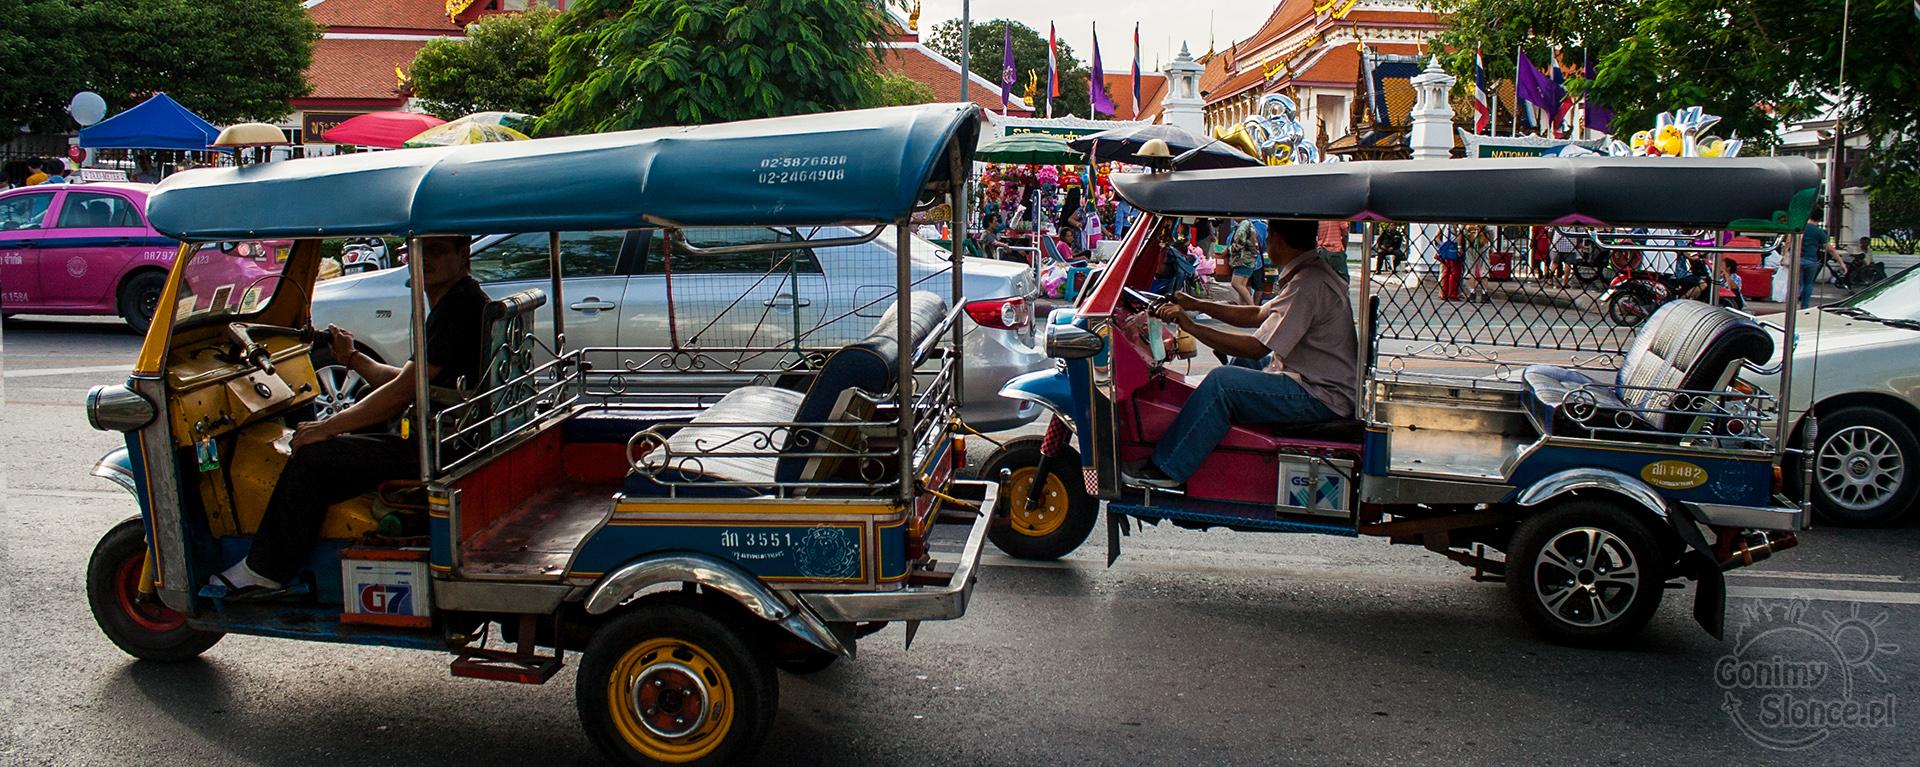 Bangkok, Tuk tuk czy warto?